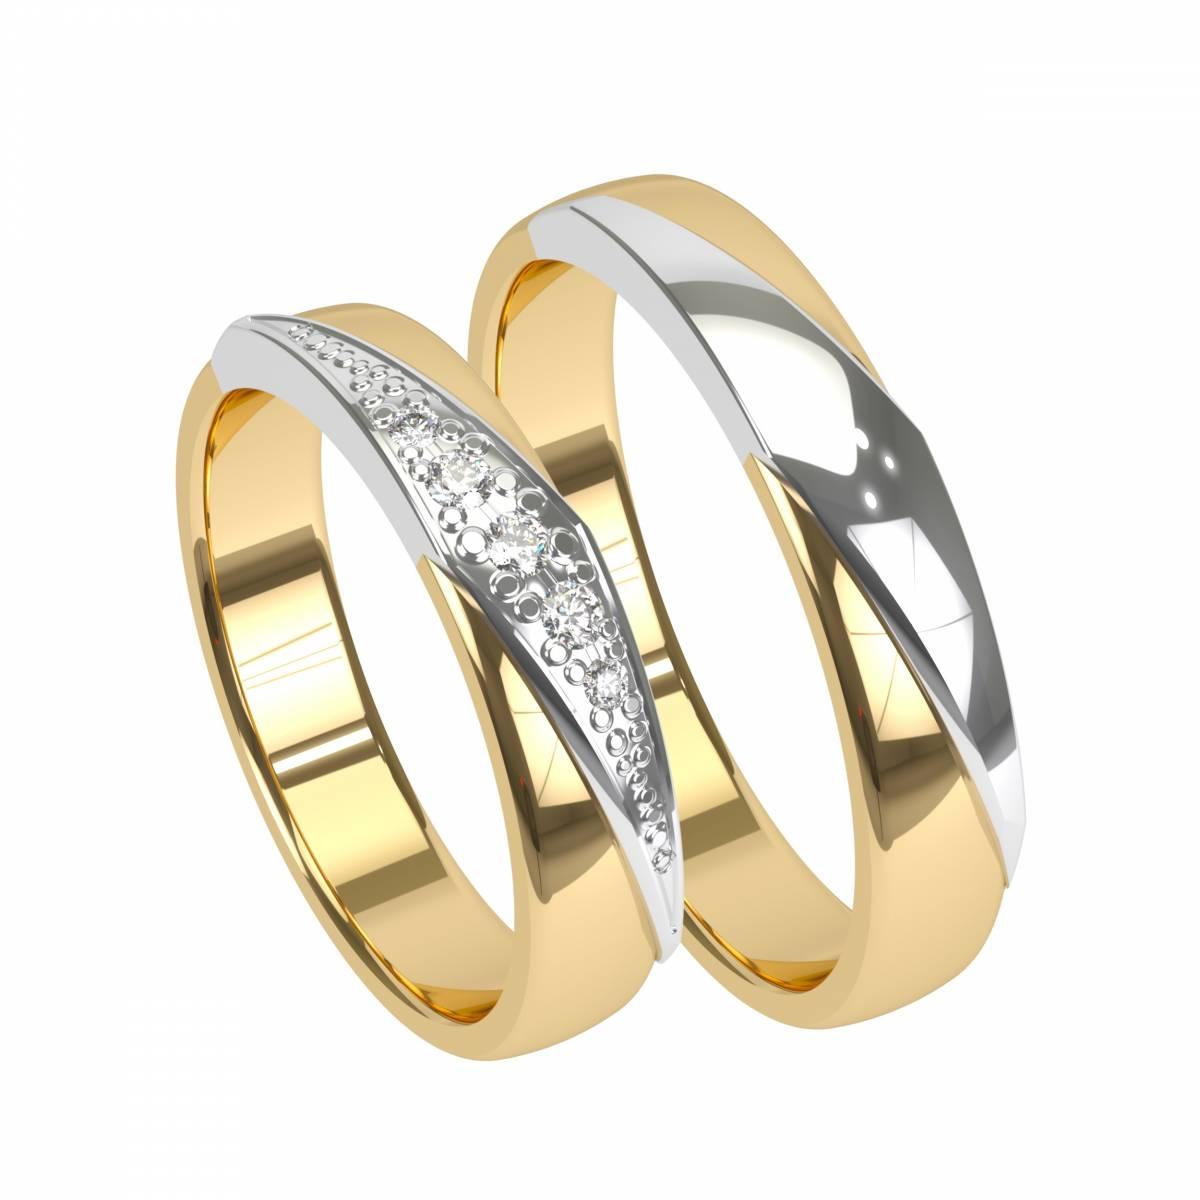 Juwelier Jan Maes - Trouwringen - Verlovingsringen - Juwelen - House of Weddings - 3